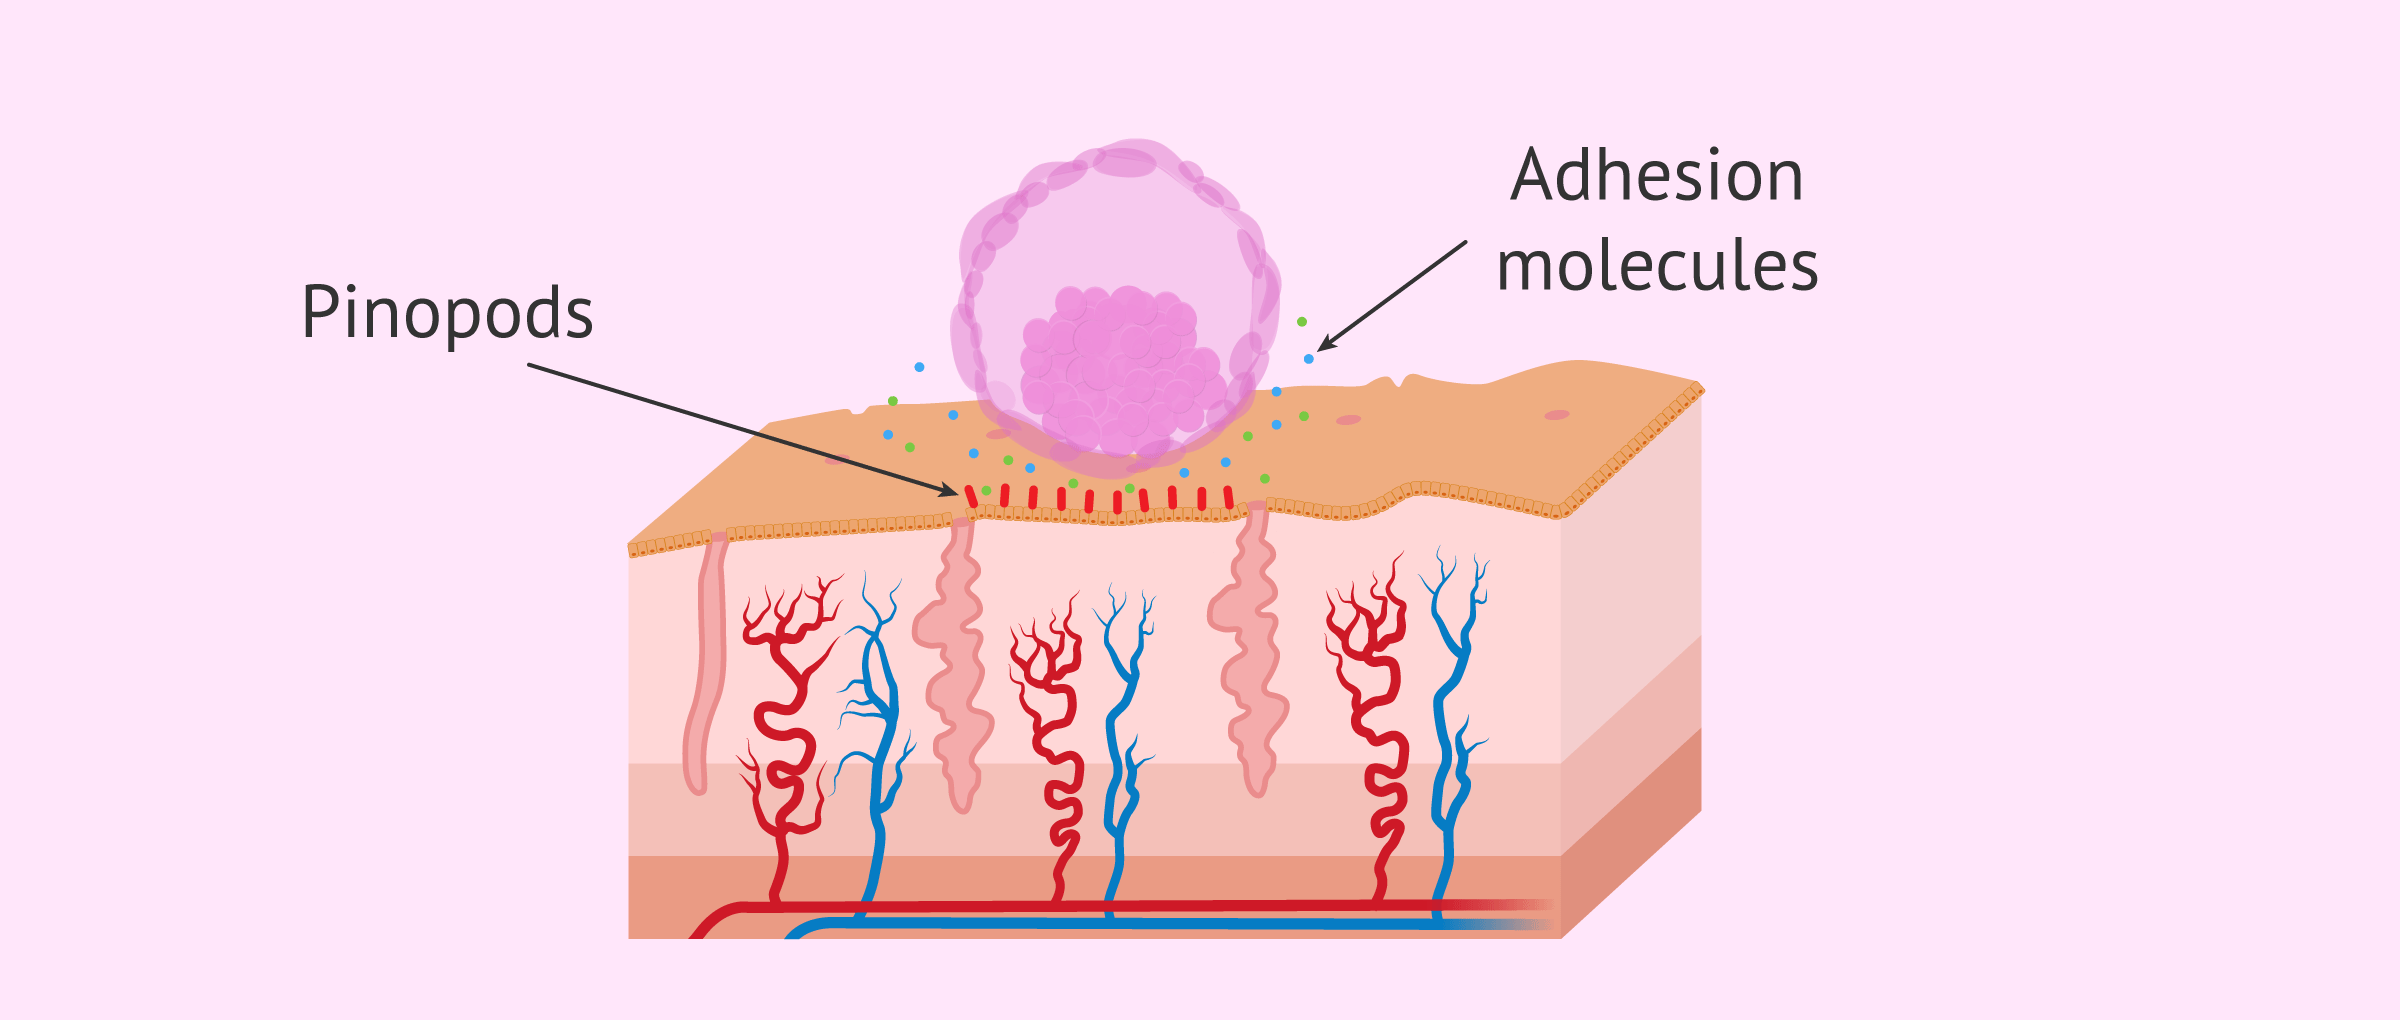 Imagen: Apposition of embryo